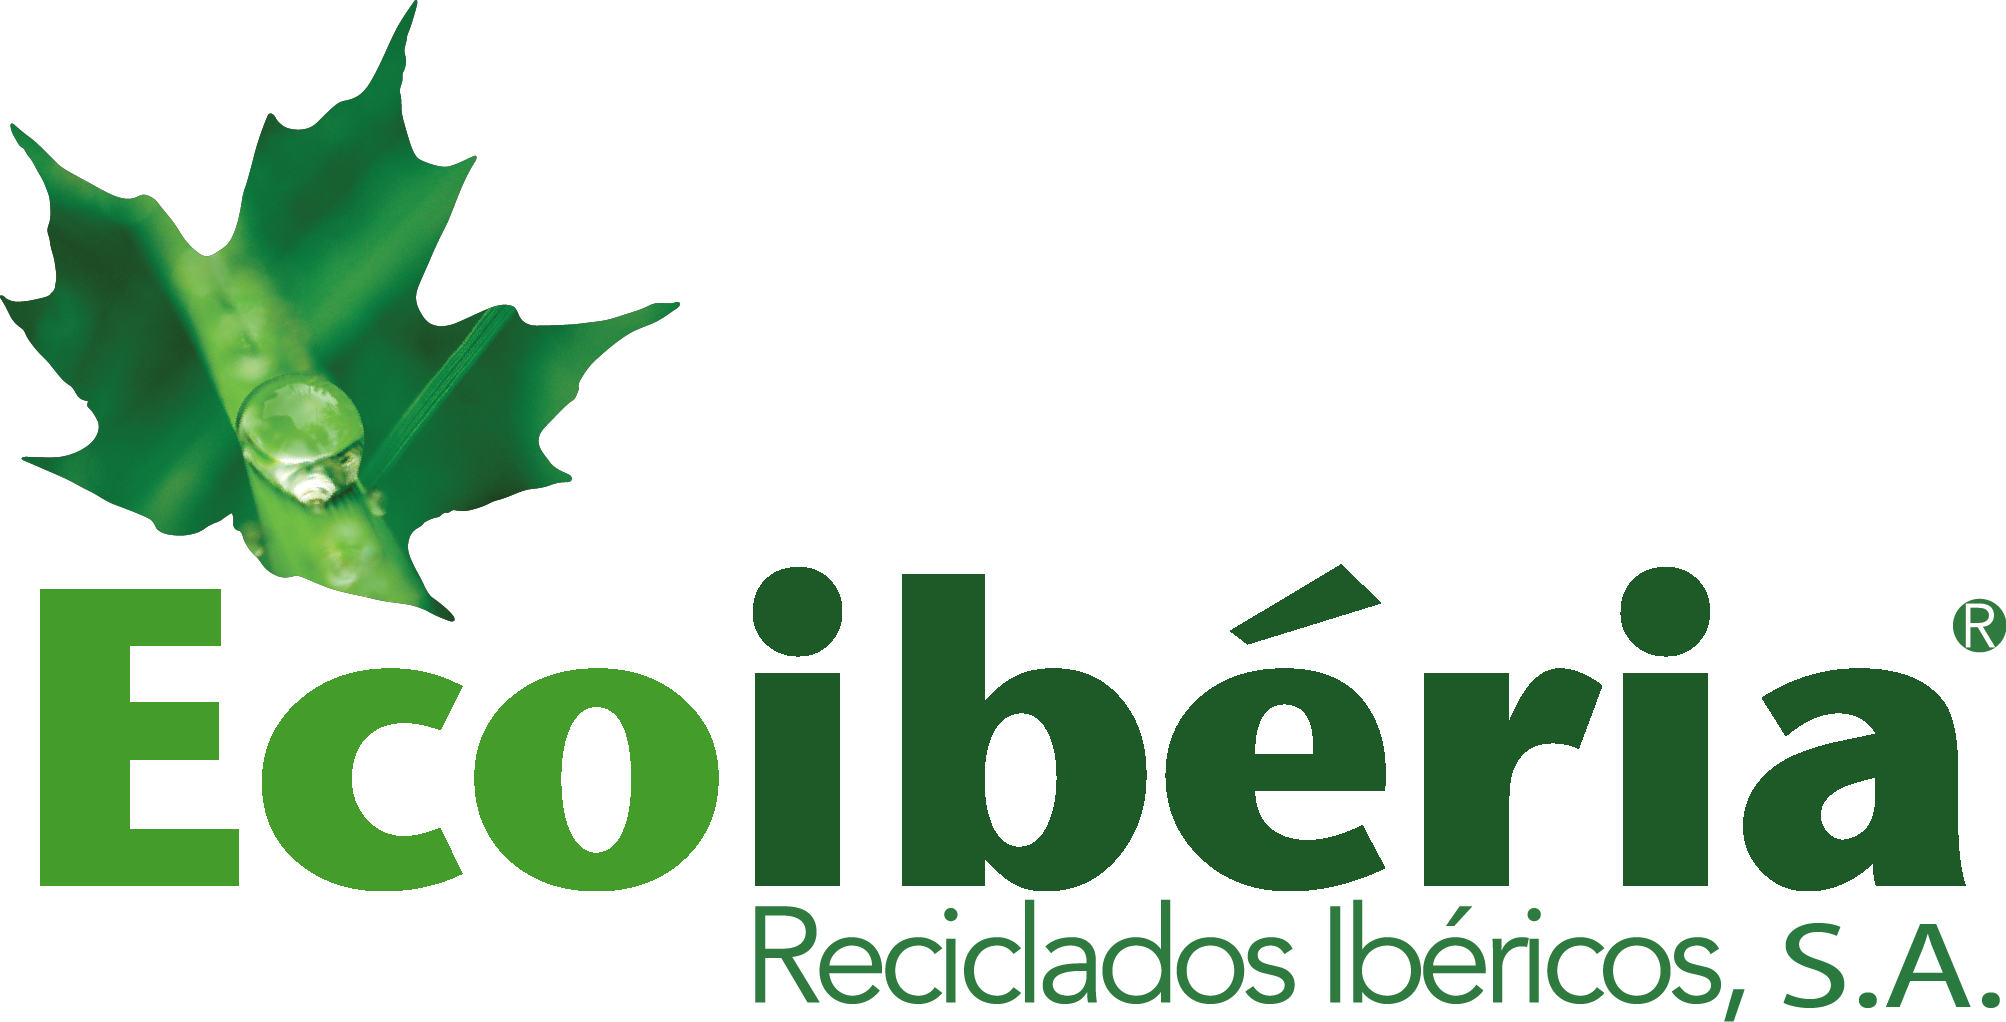 https://europeanplasticspact.org/wp-content/uploads/2020/03/Ecoiberia-Reciclados-Ibericos-S.A..png